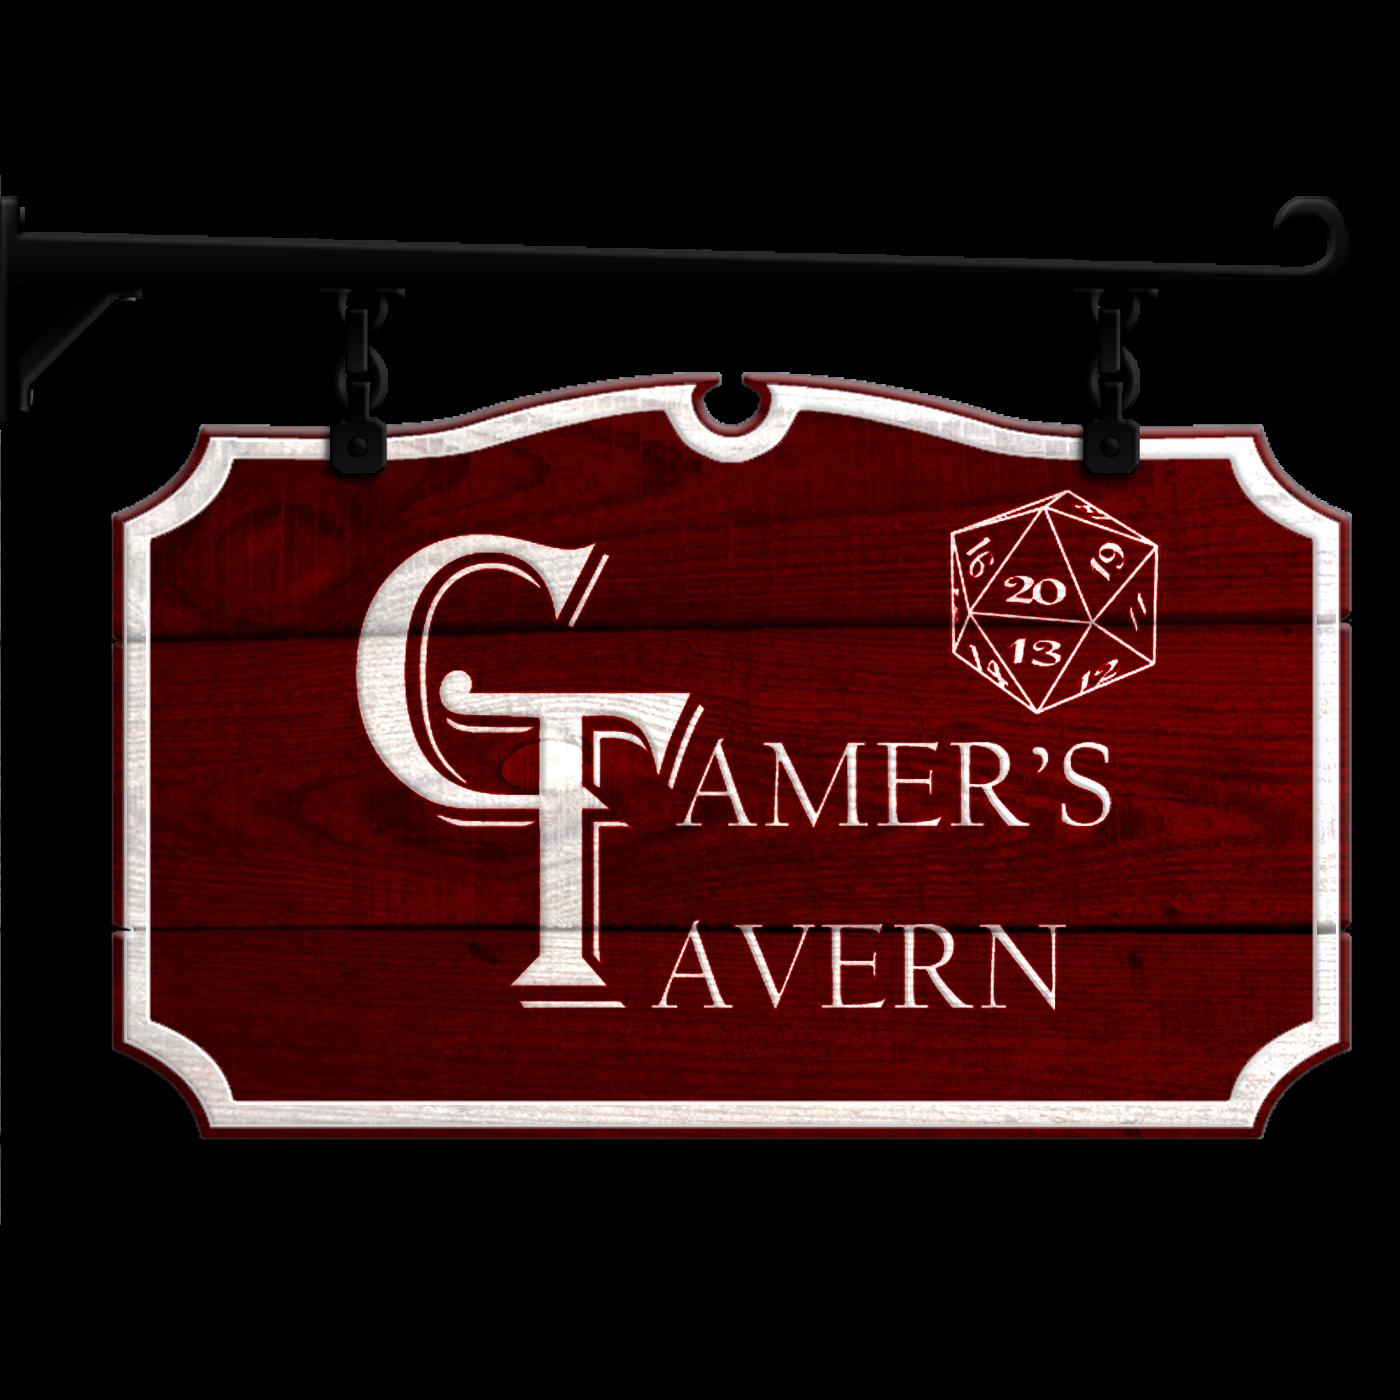 Game Table Episode 6: Enter Molly Mayhem